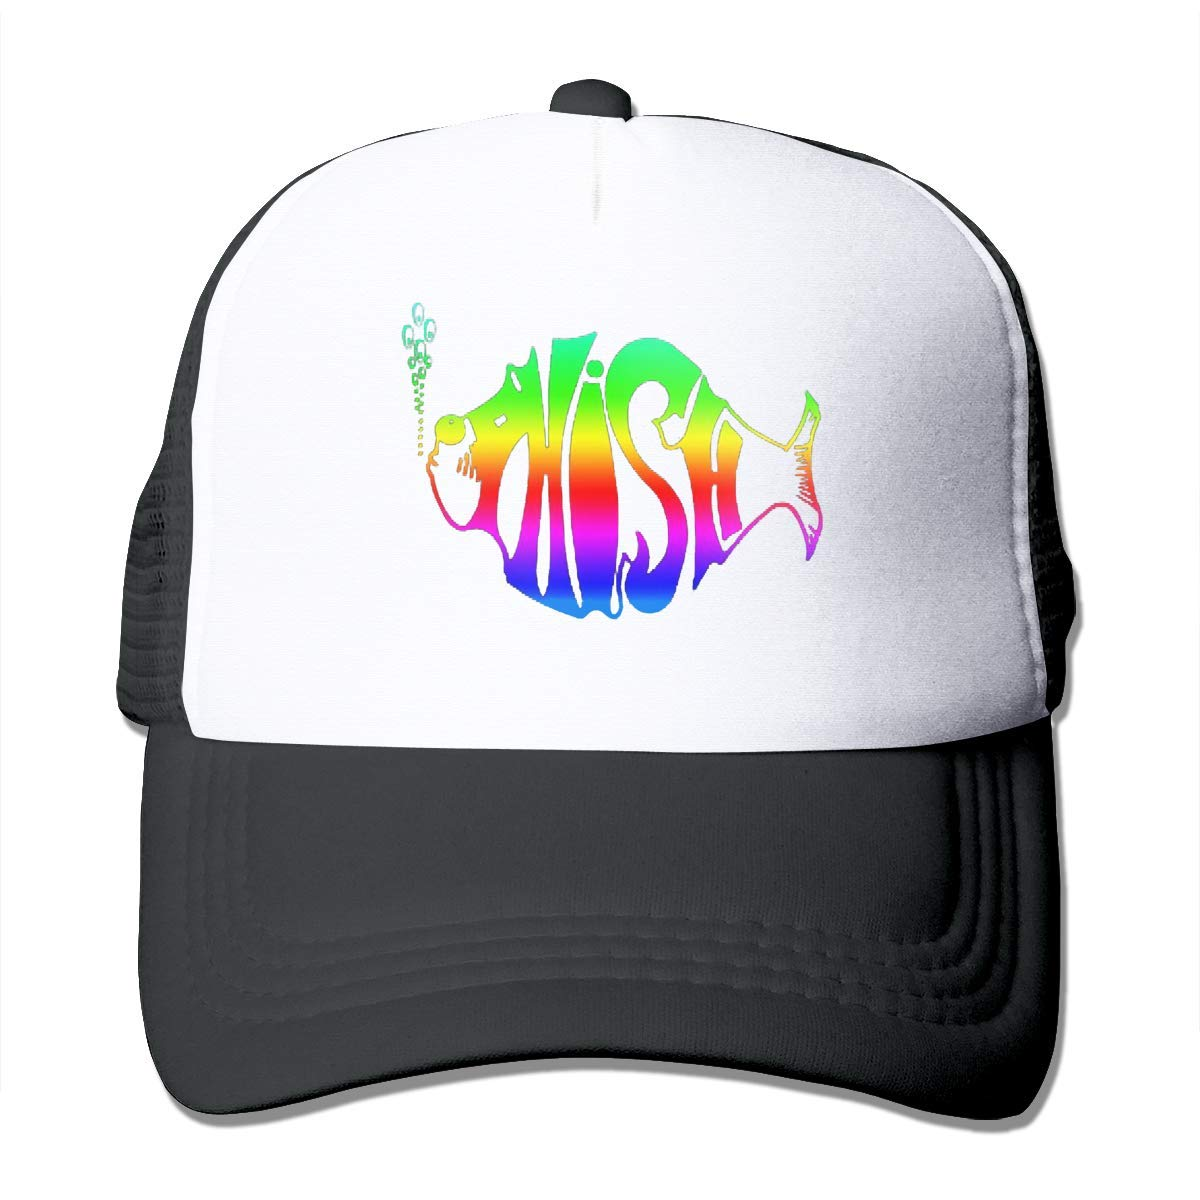 Classic Baseball Cap,Rainbow Phish Adjustable Two Tone Cotton Twill Mesh Back Trucker Hats Black